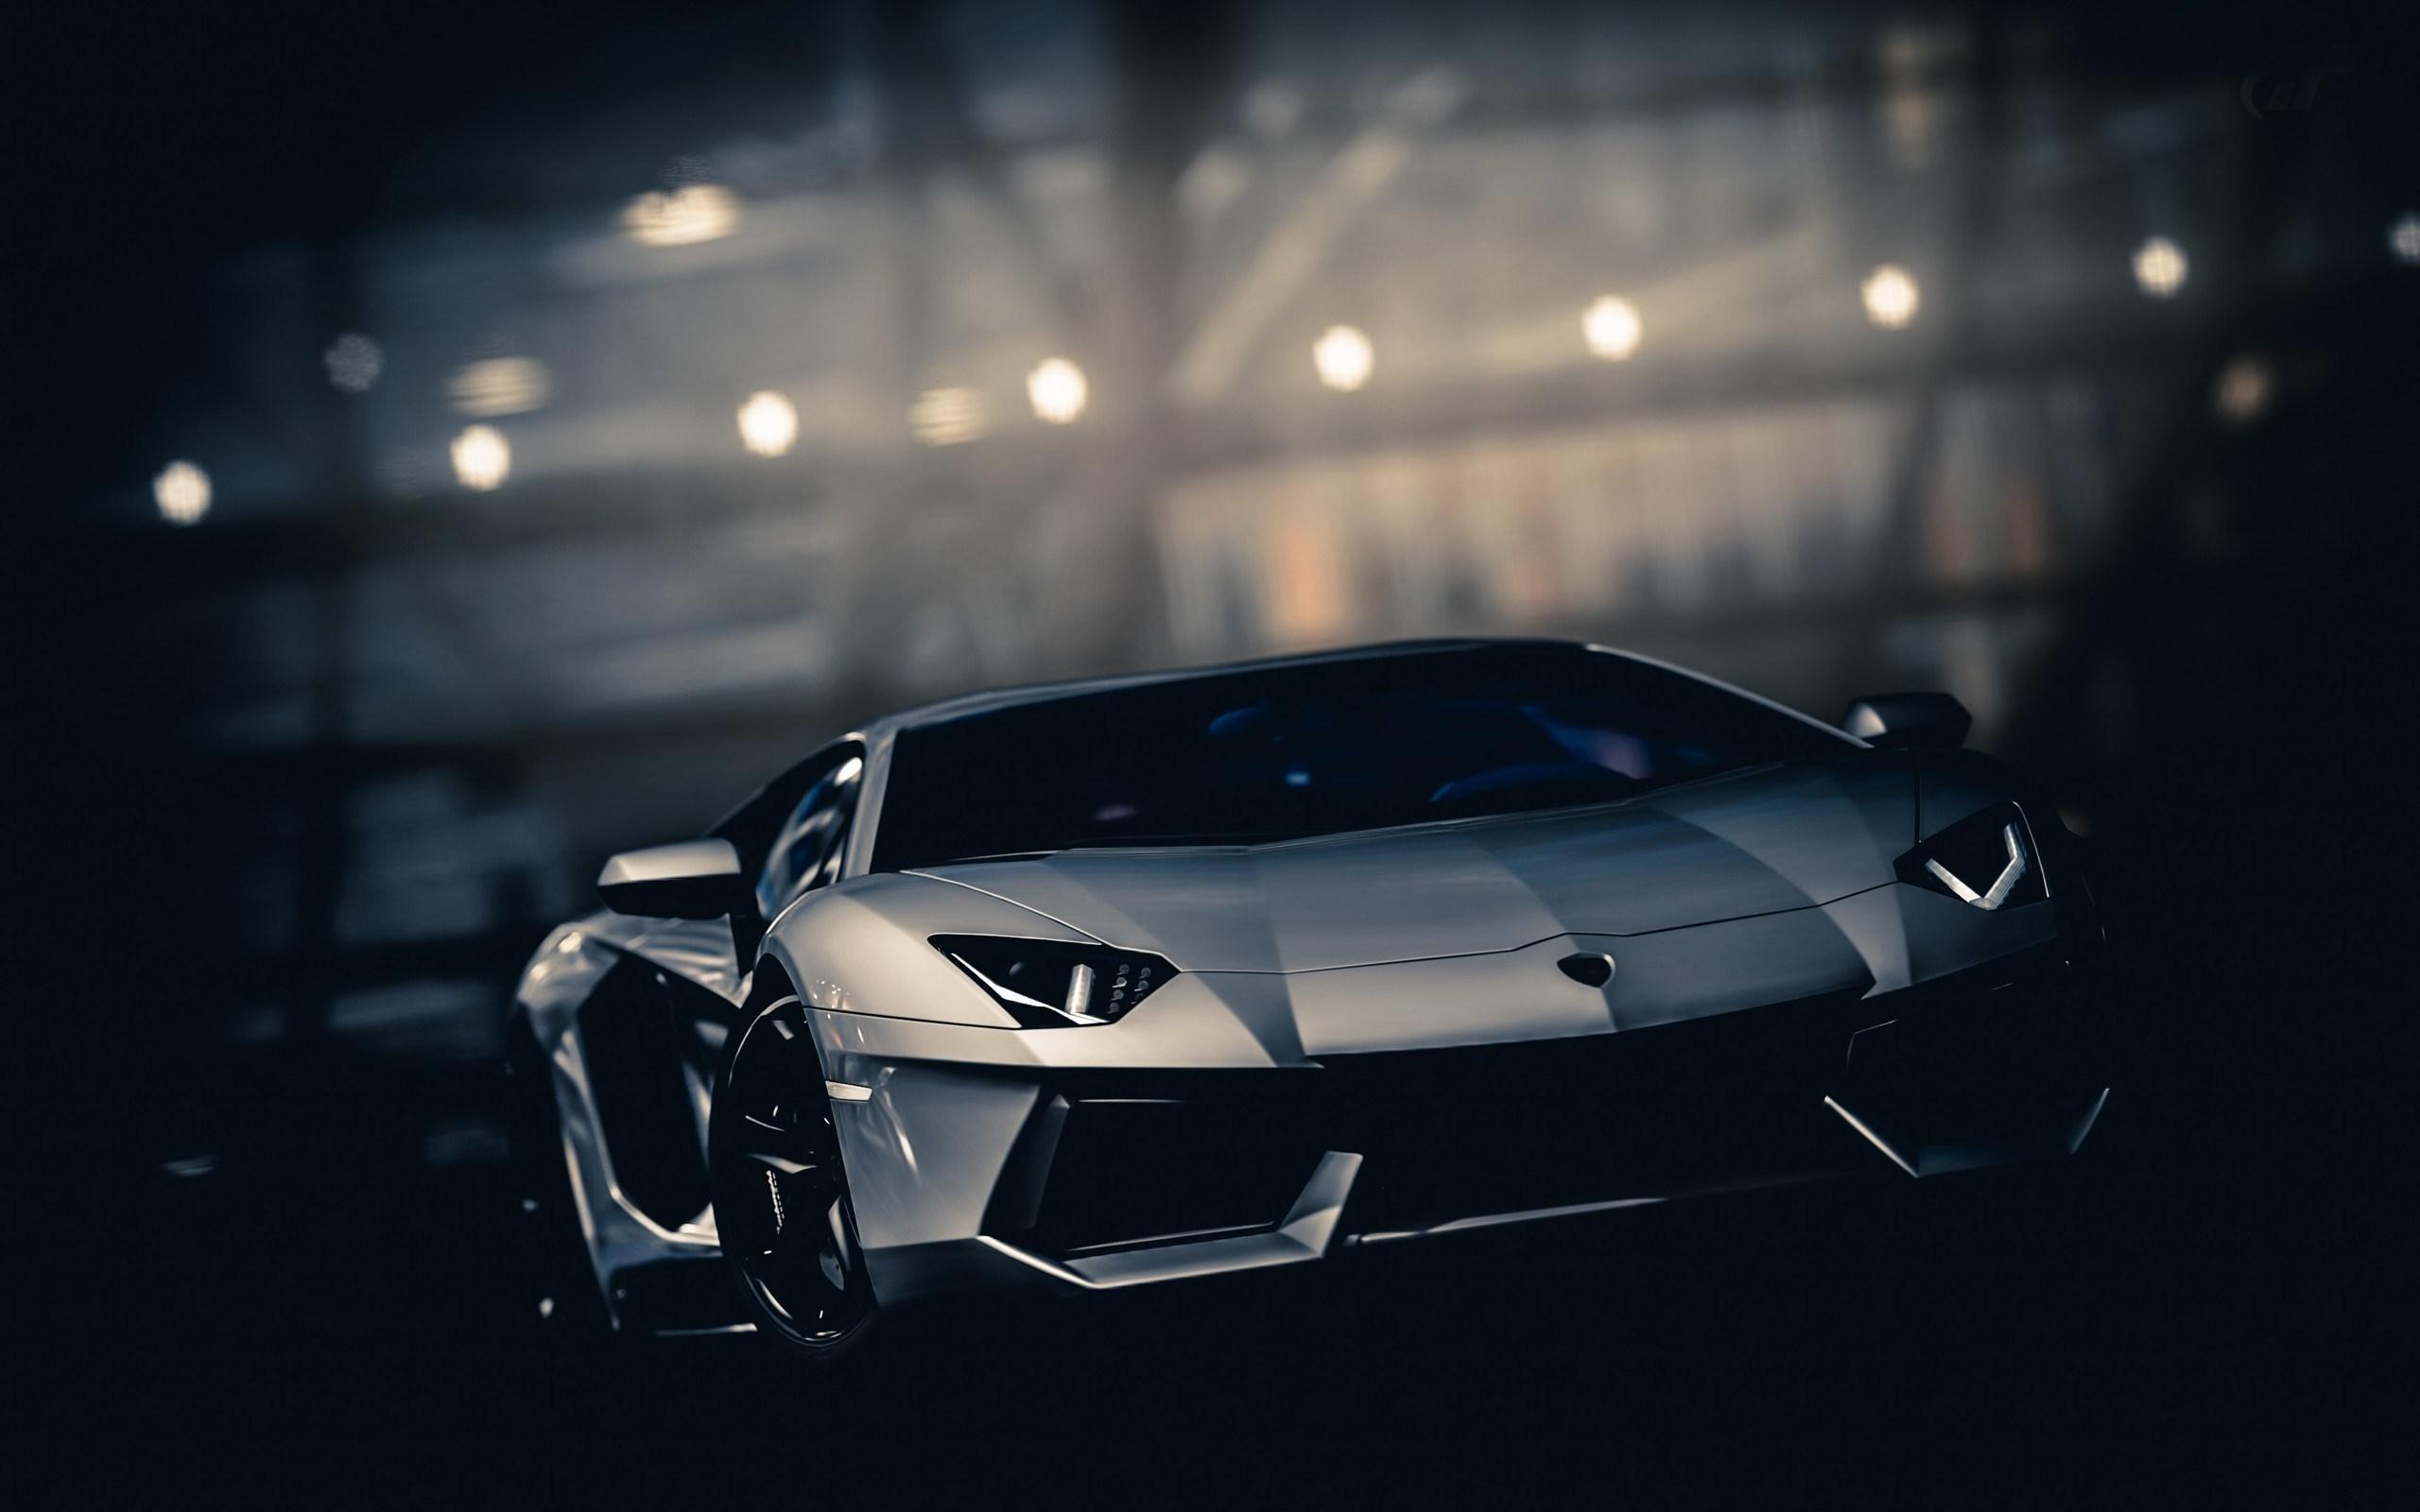 50 Super Sports Car Wallpapers Thatll Blow Your Desktop Away 2560x1600